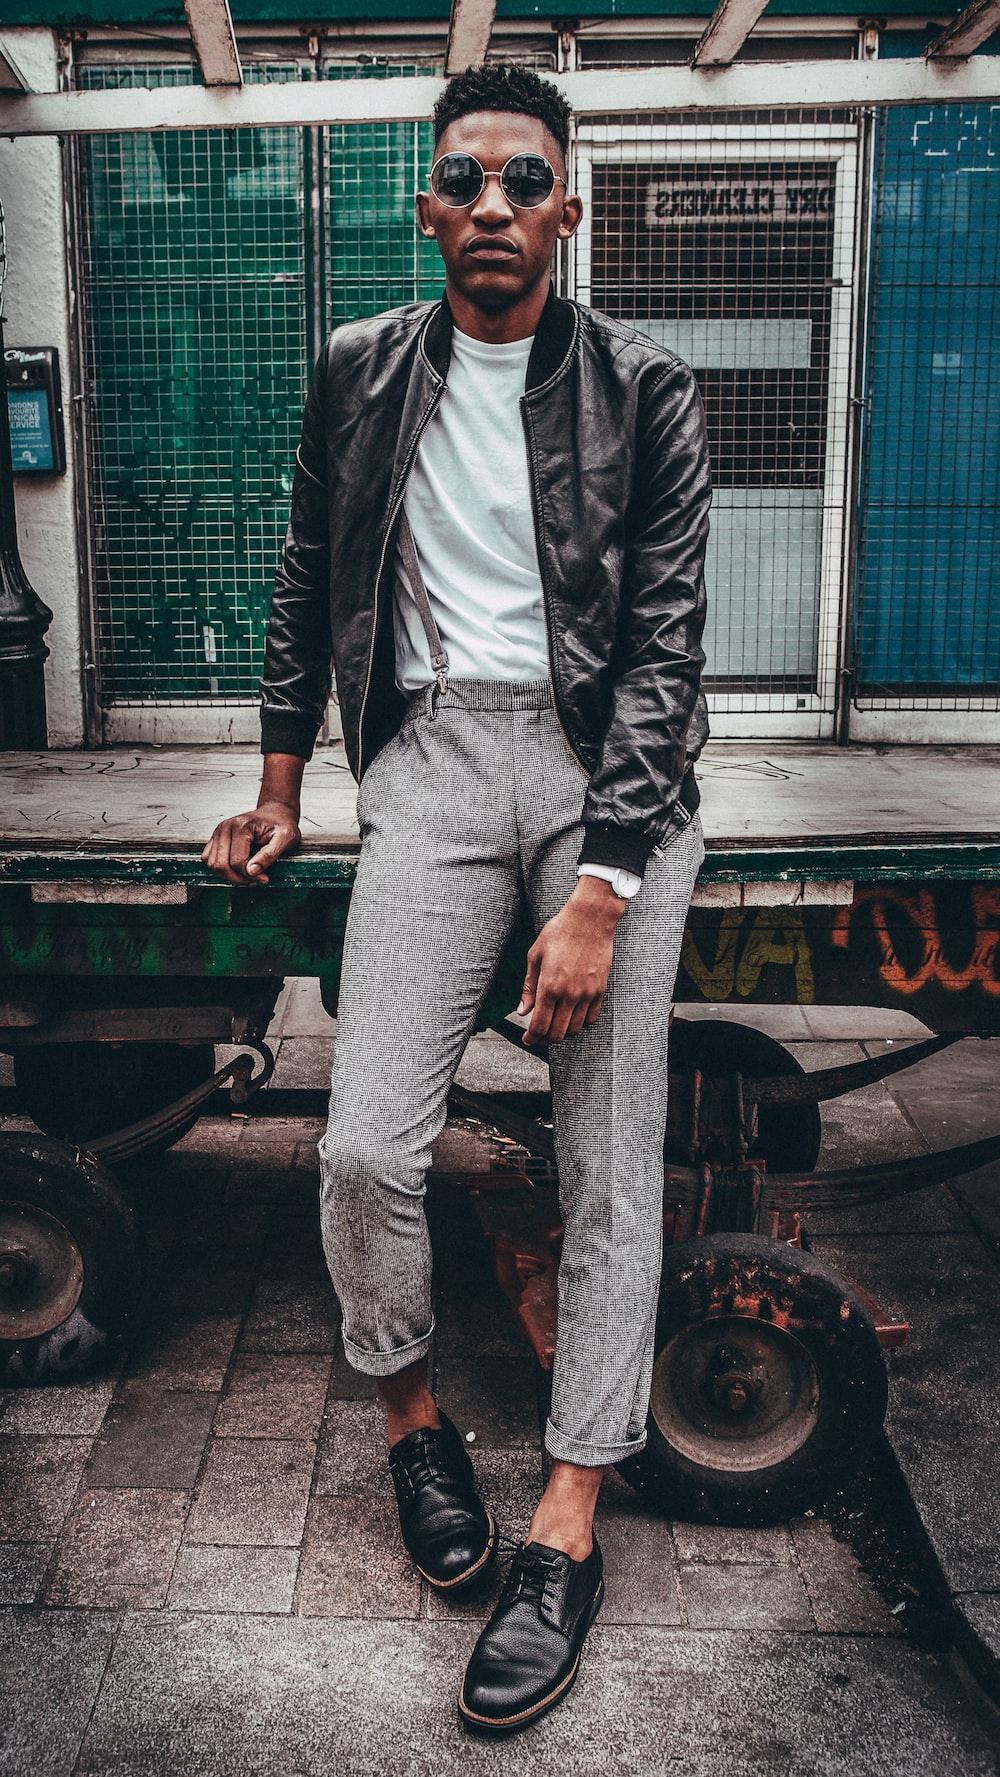 man in black jacket posing